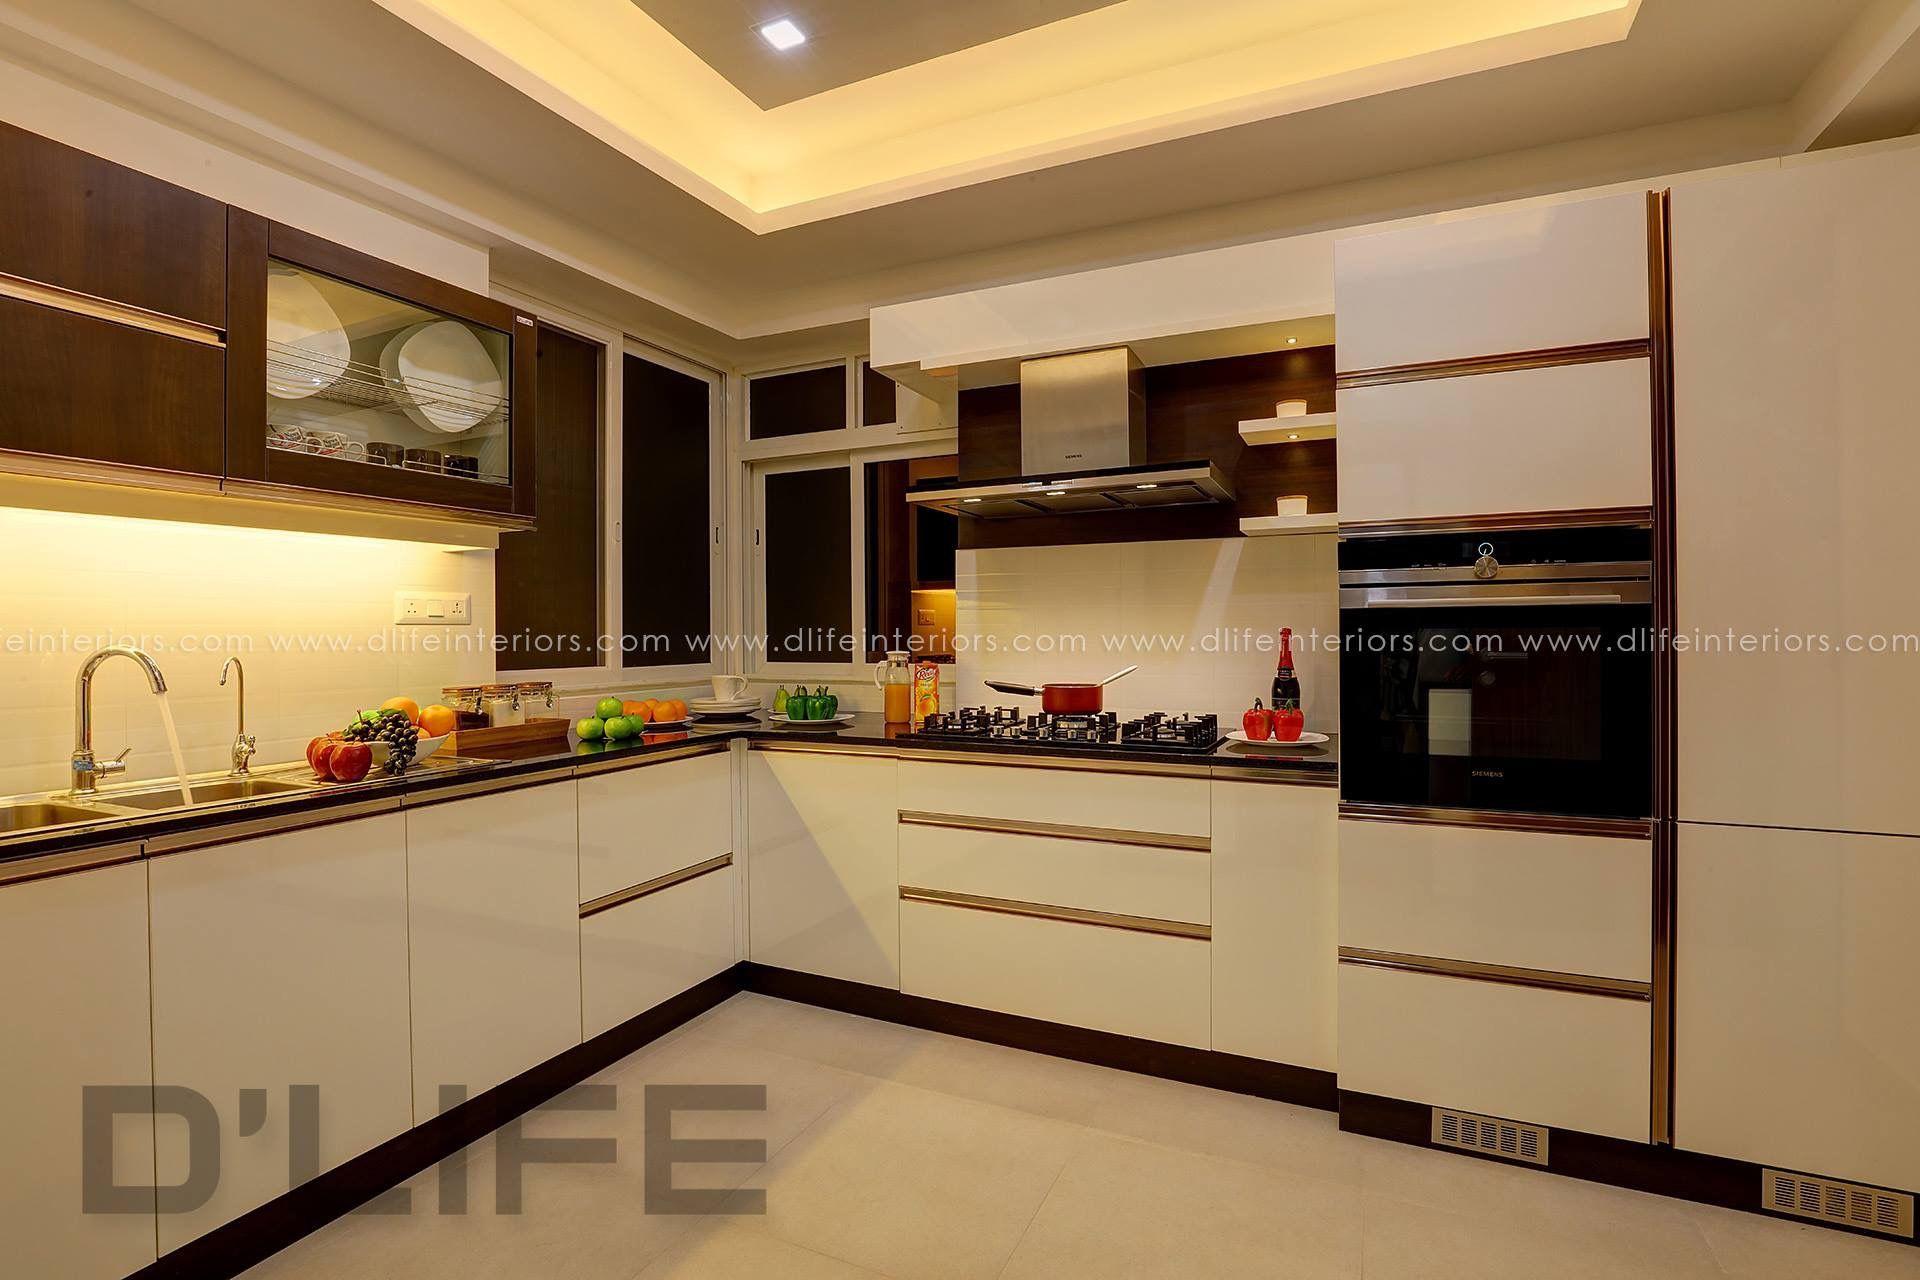 D'life home interiors kochi kerala pin by noreen thomas on homedecor  pinterest